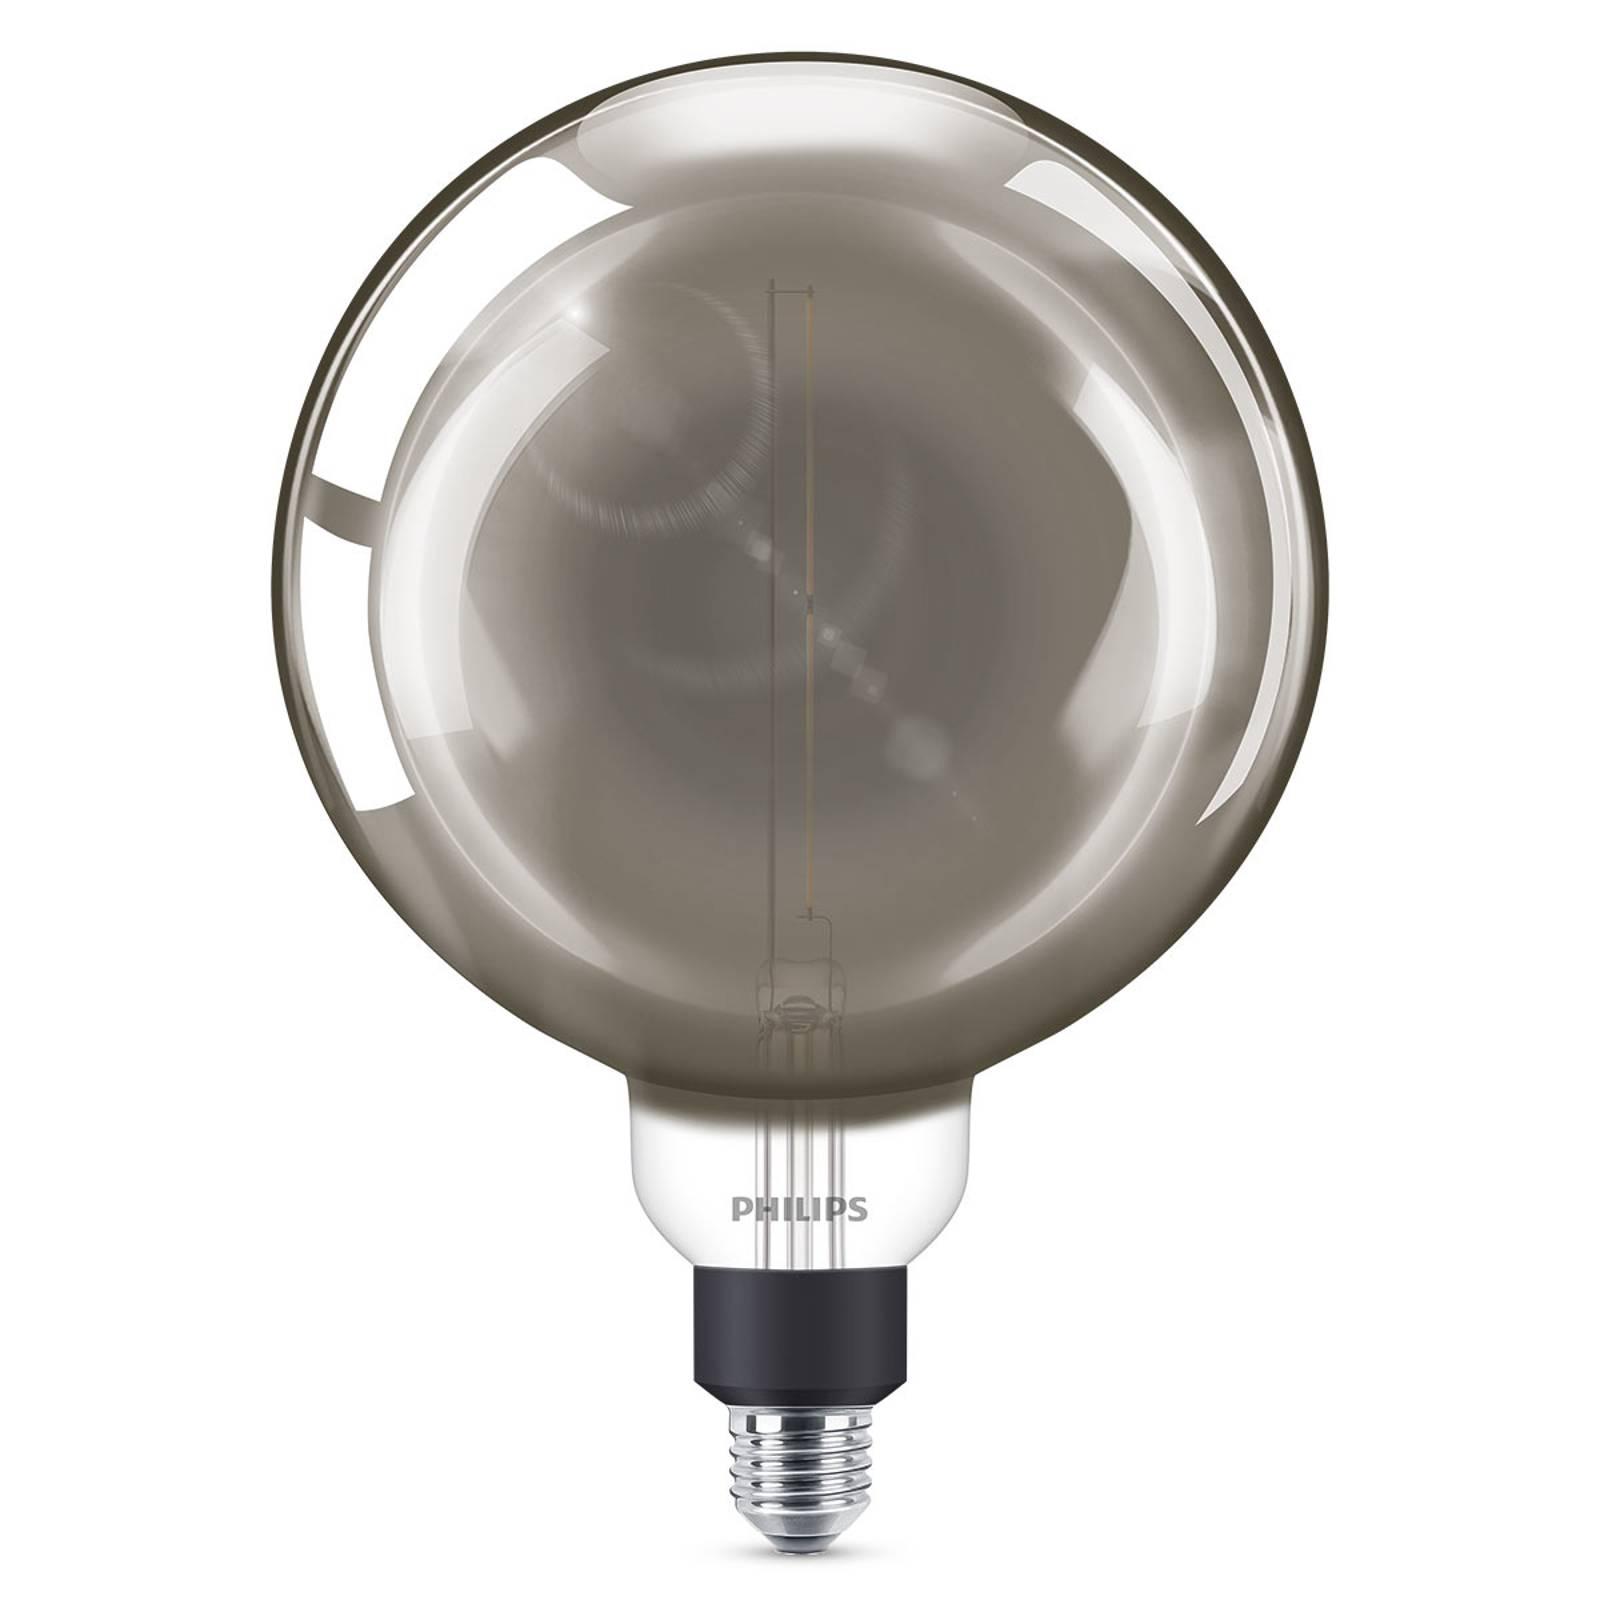 Philips E27 Giant -LED-globe-lamppu 6,5W himmennys